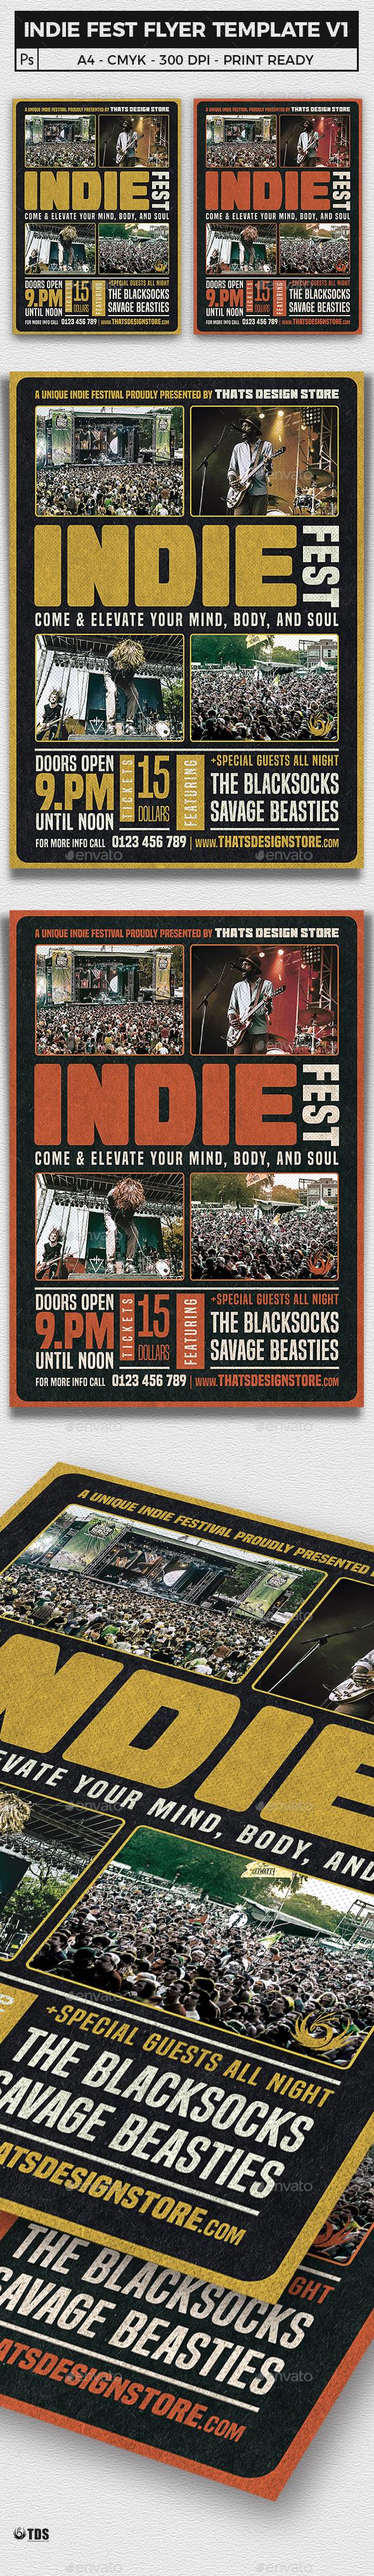 Indie Fest Flyer Template V1 - Concerts Events